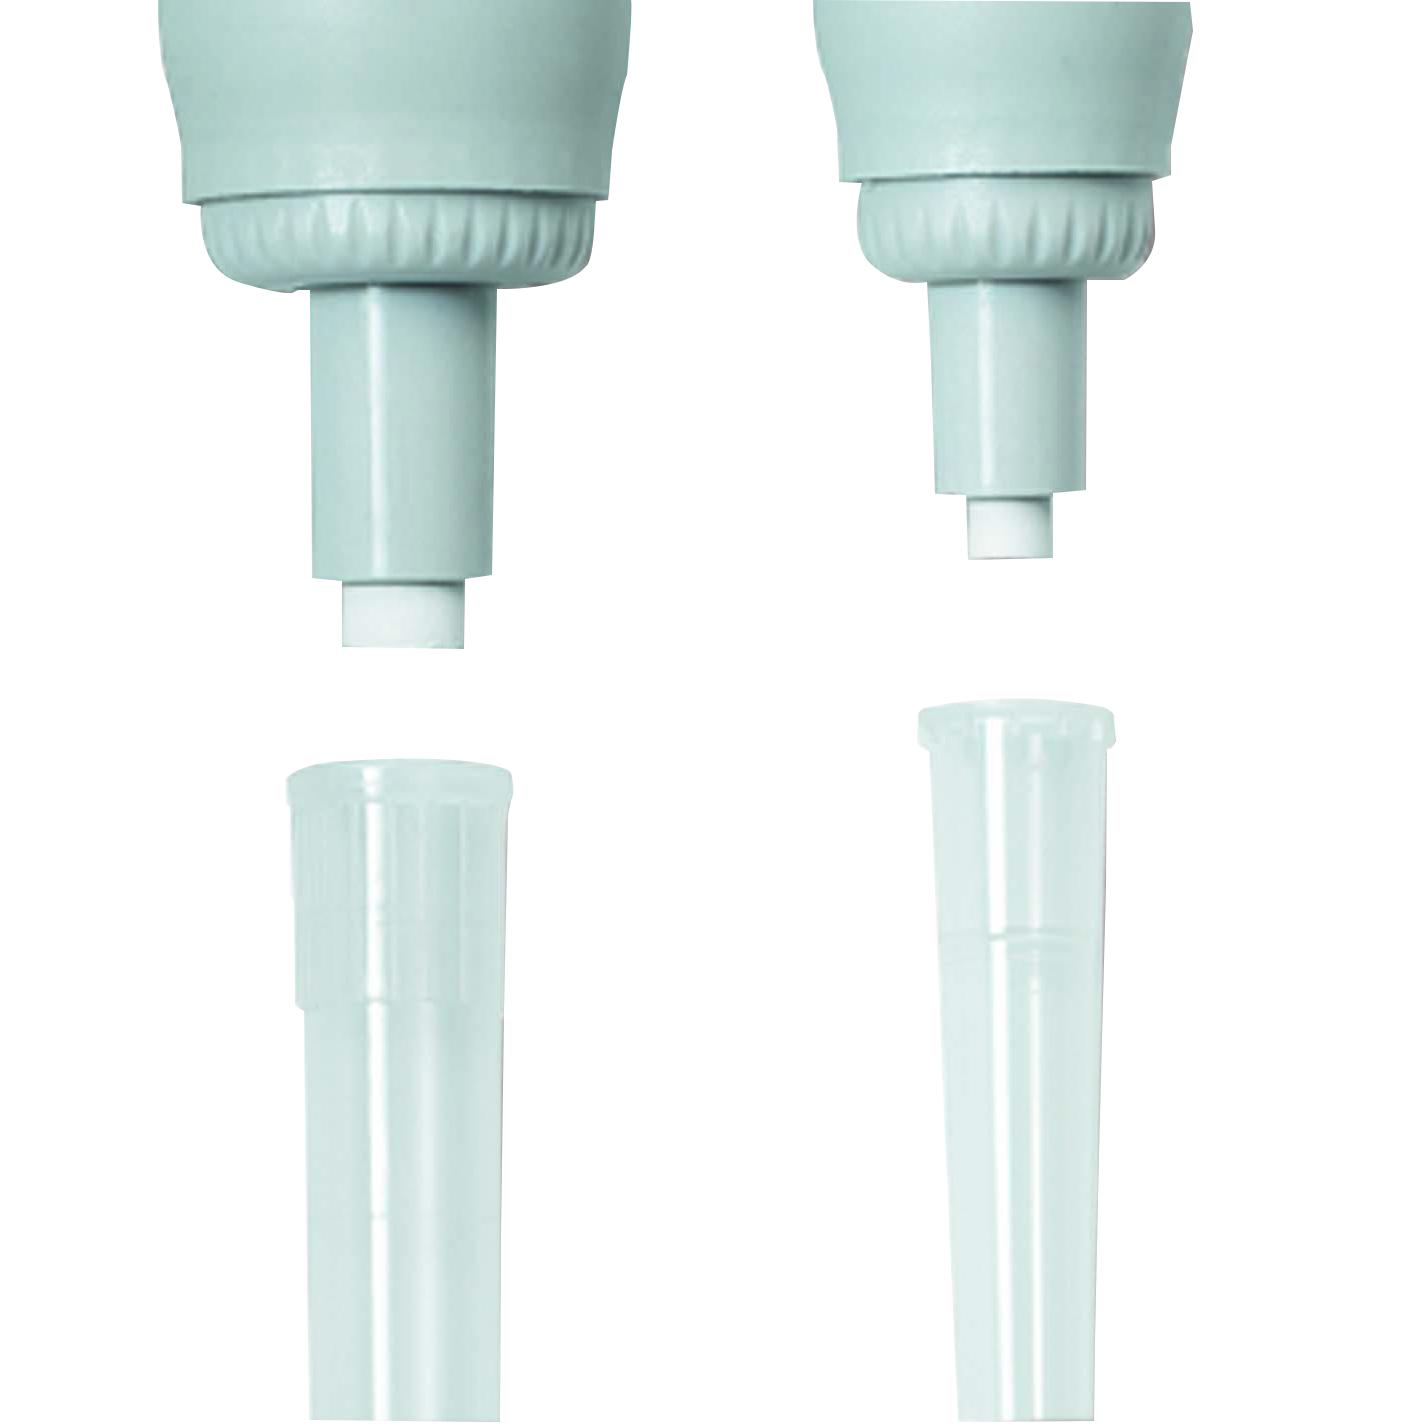 SOCOREX® ACURA® Macro Pipette Accessories, Nozzle Protection Filters For 10 mL Model, PP Fibers